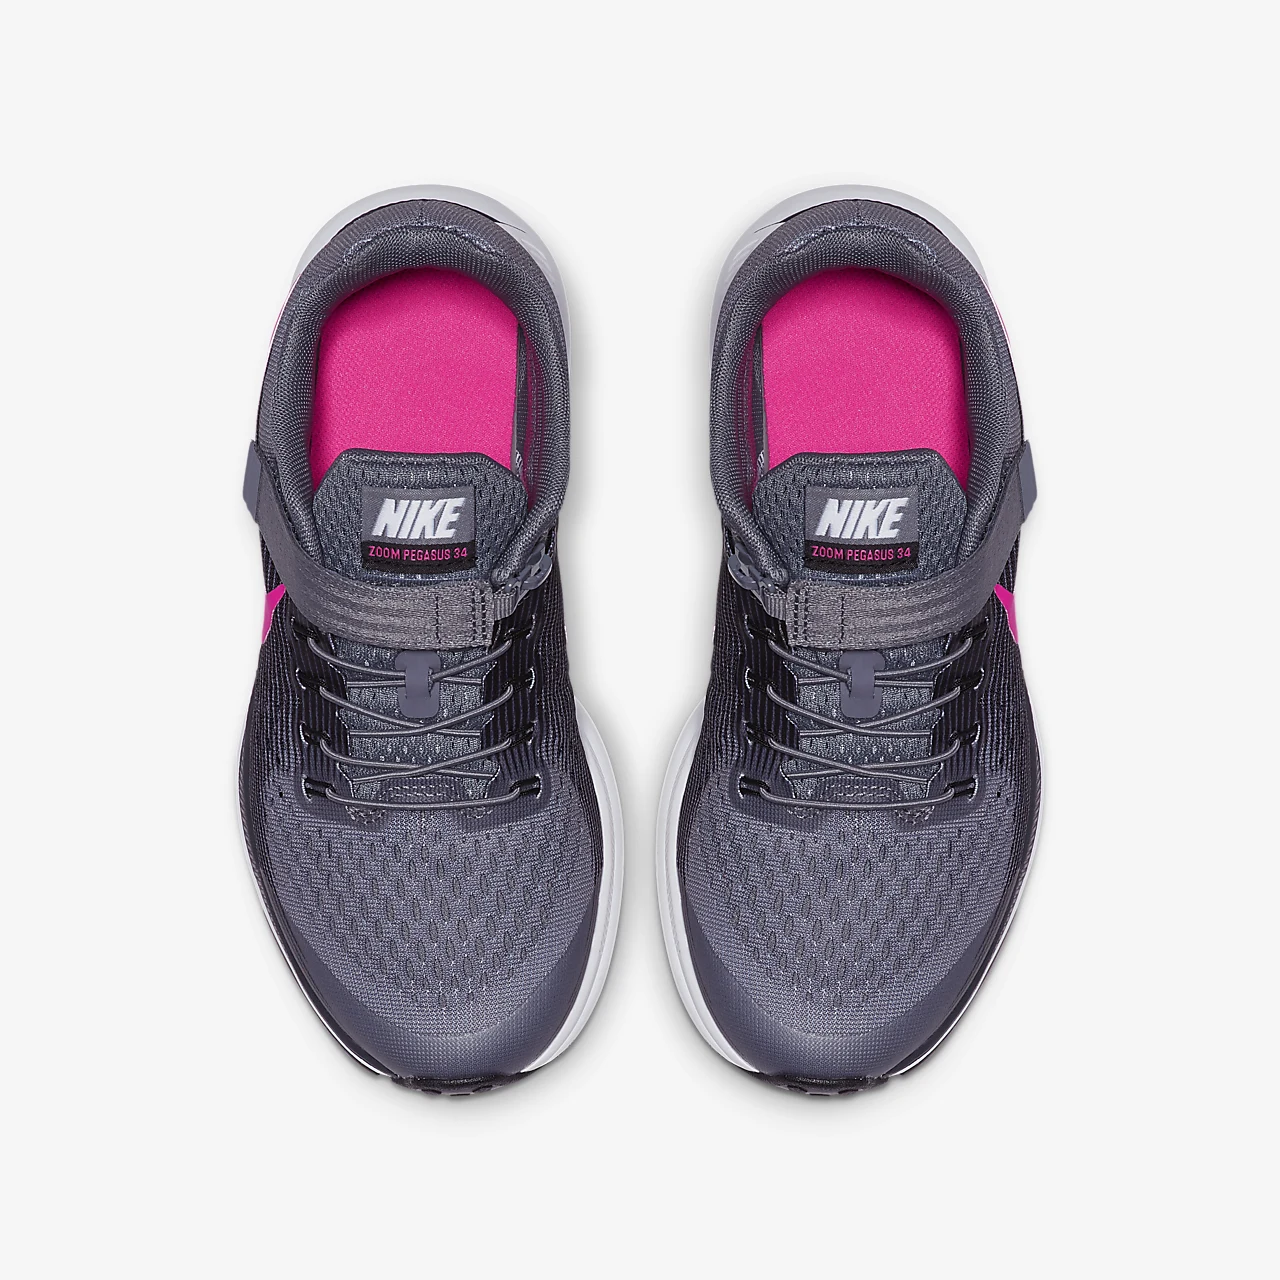 Nike Zoom Pegasus 34 FlyEase Little/Big Kids' Running Shoe 918019-003